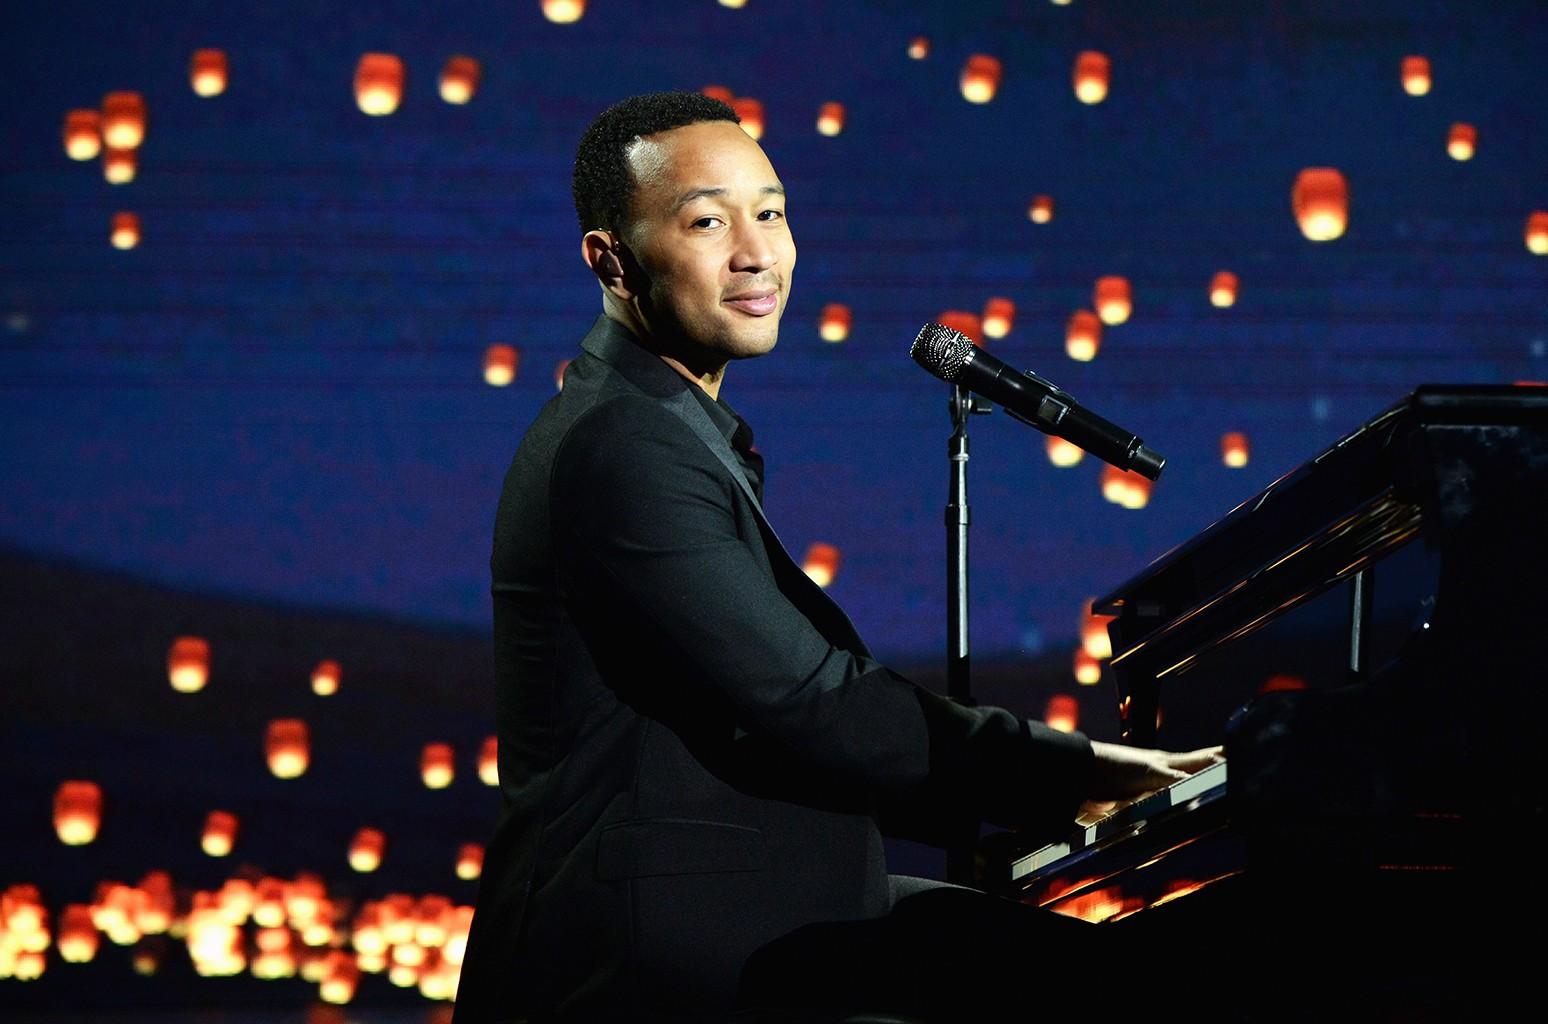 John Legend performs in Los Angeles